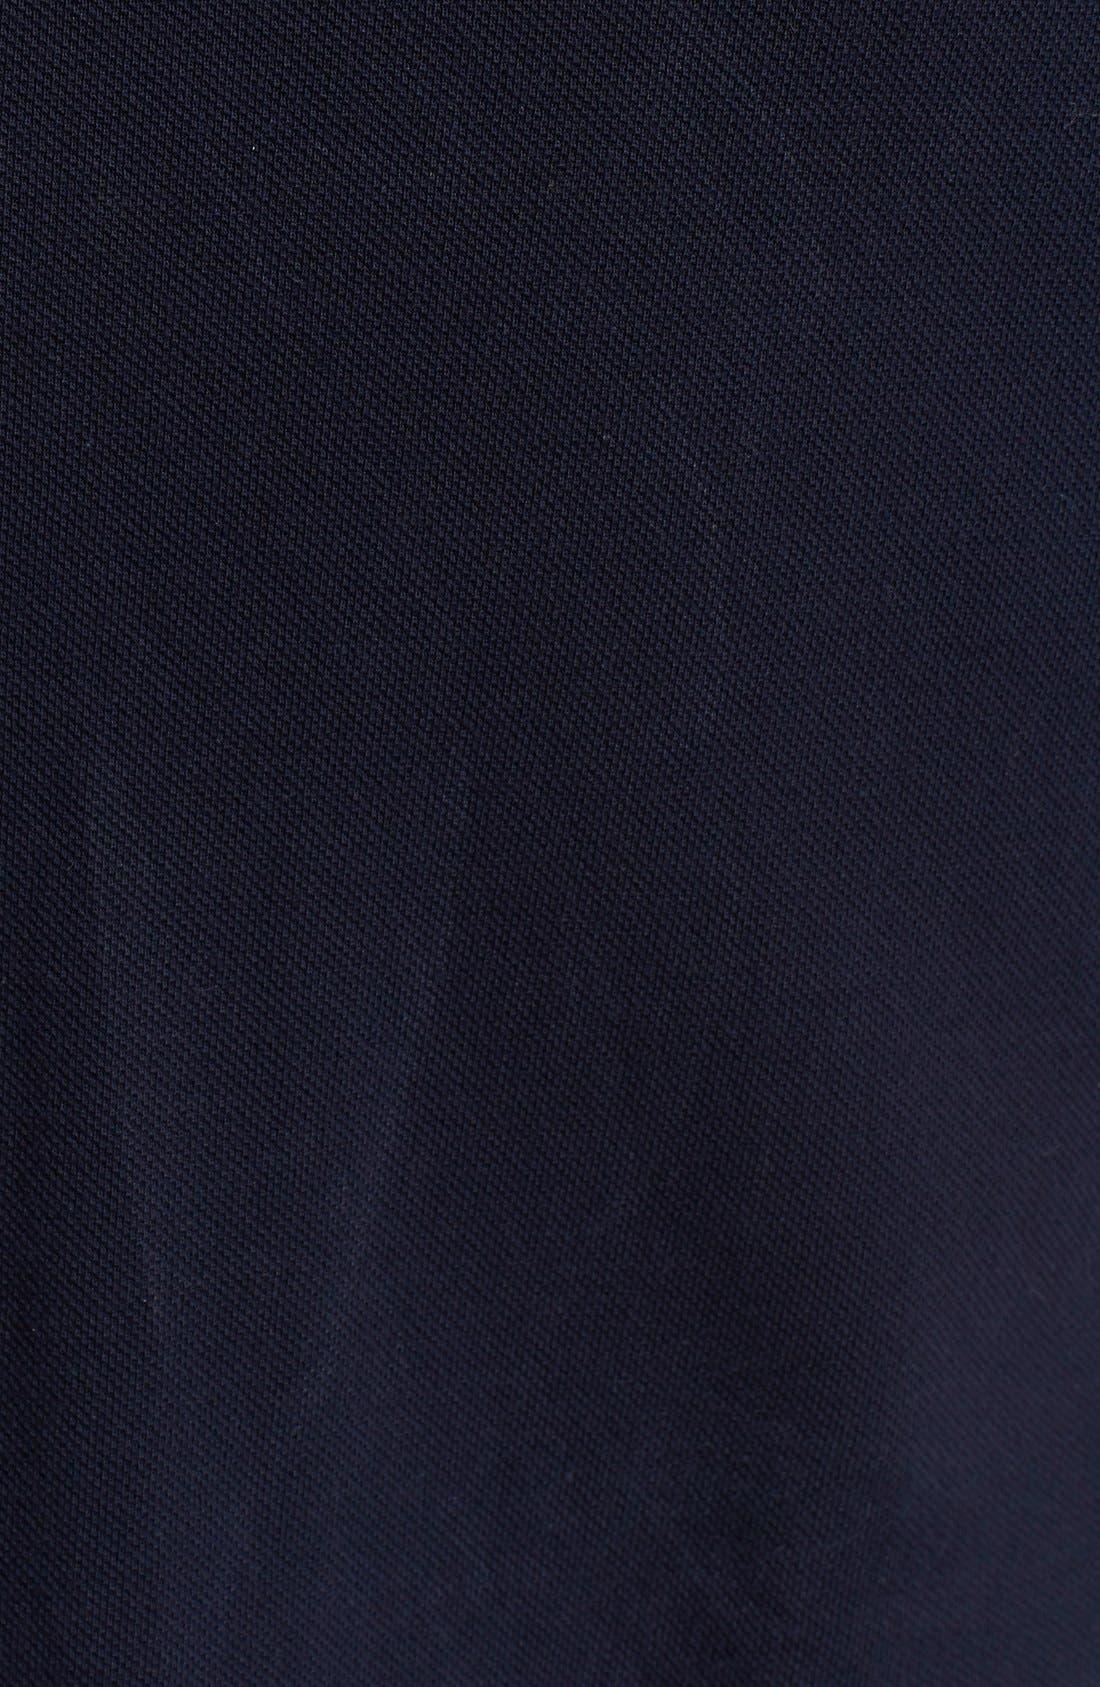 Alternate Image 3  - Comme des Garçons PLAY Piqué Polo with Small Heart Appliqué